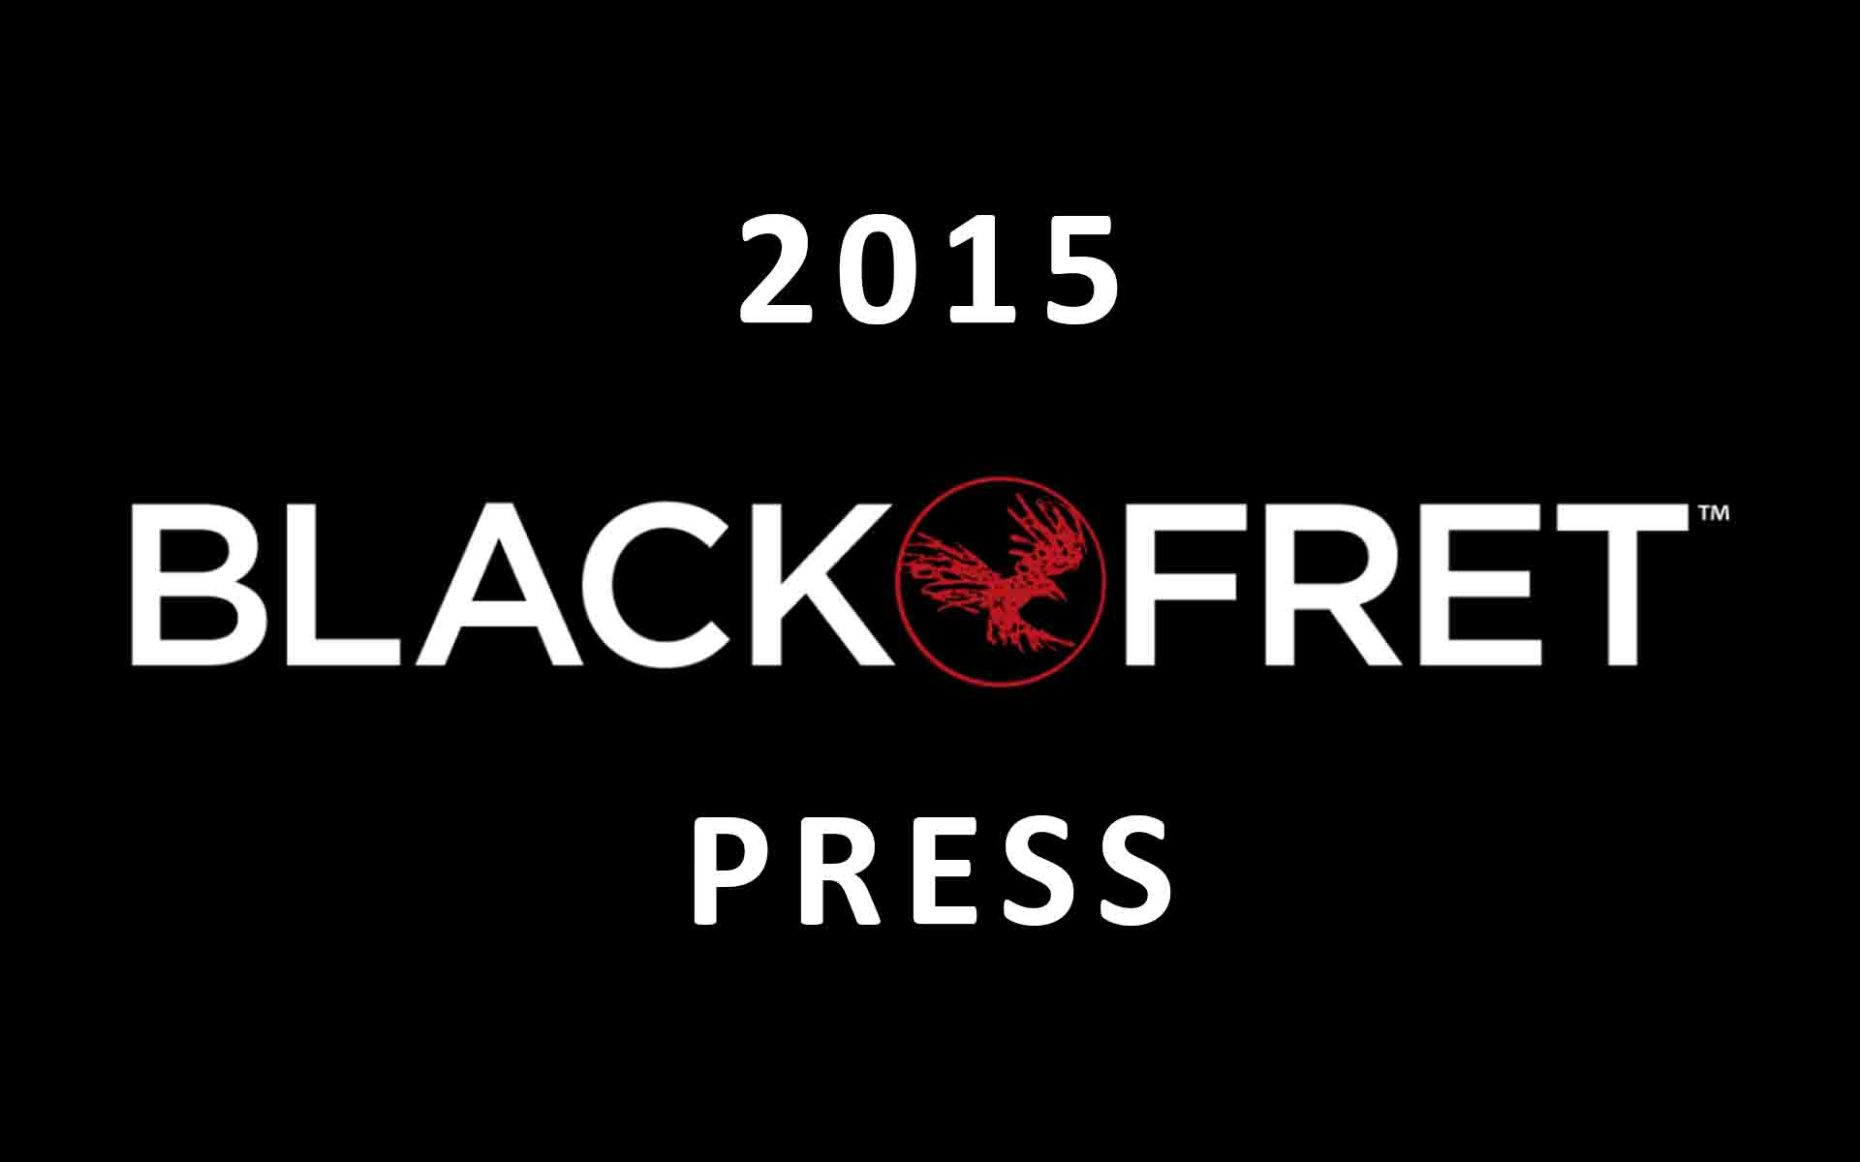 2015 PRESS